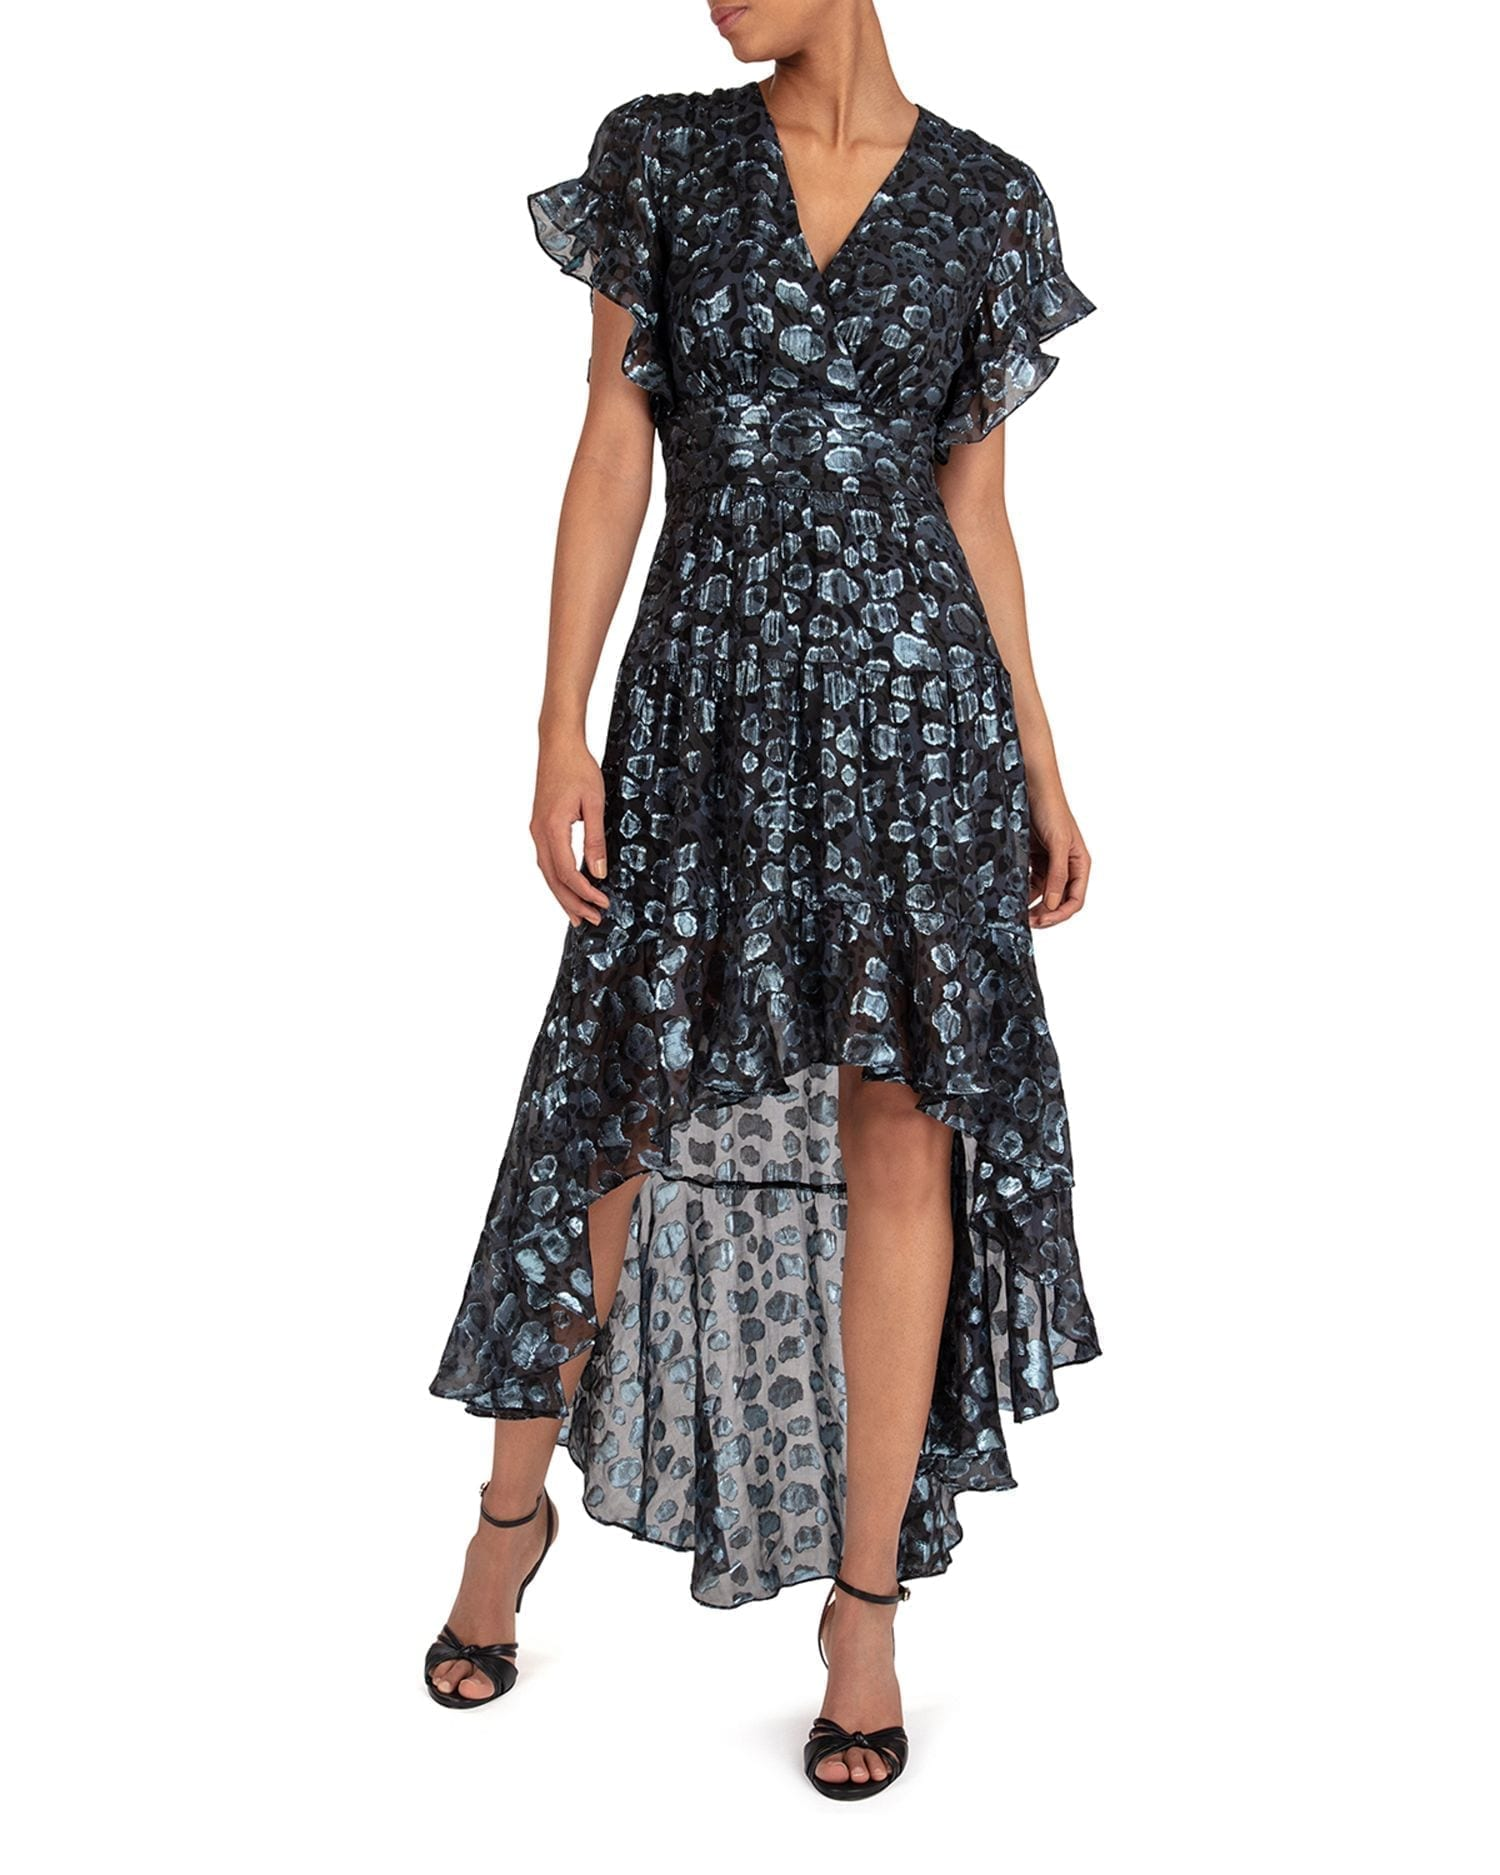 BA&SH Grace Metallic High Low Dress